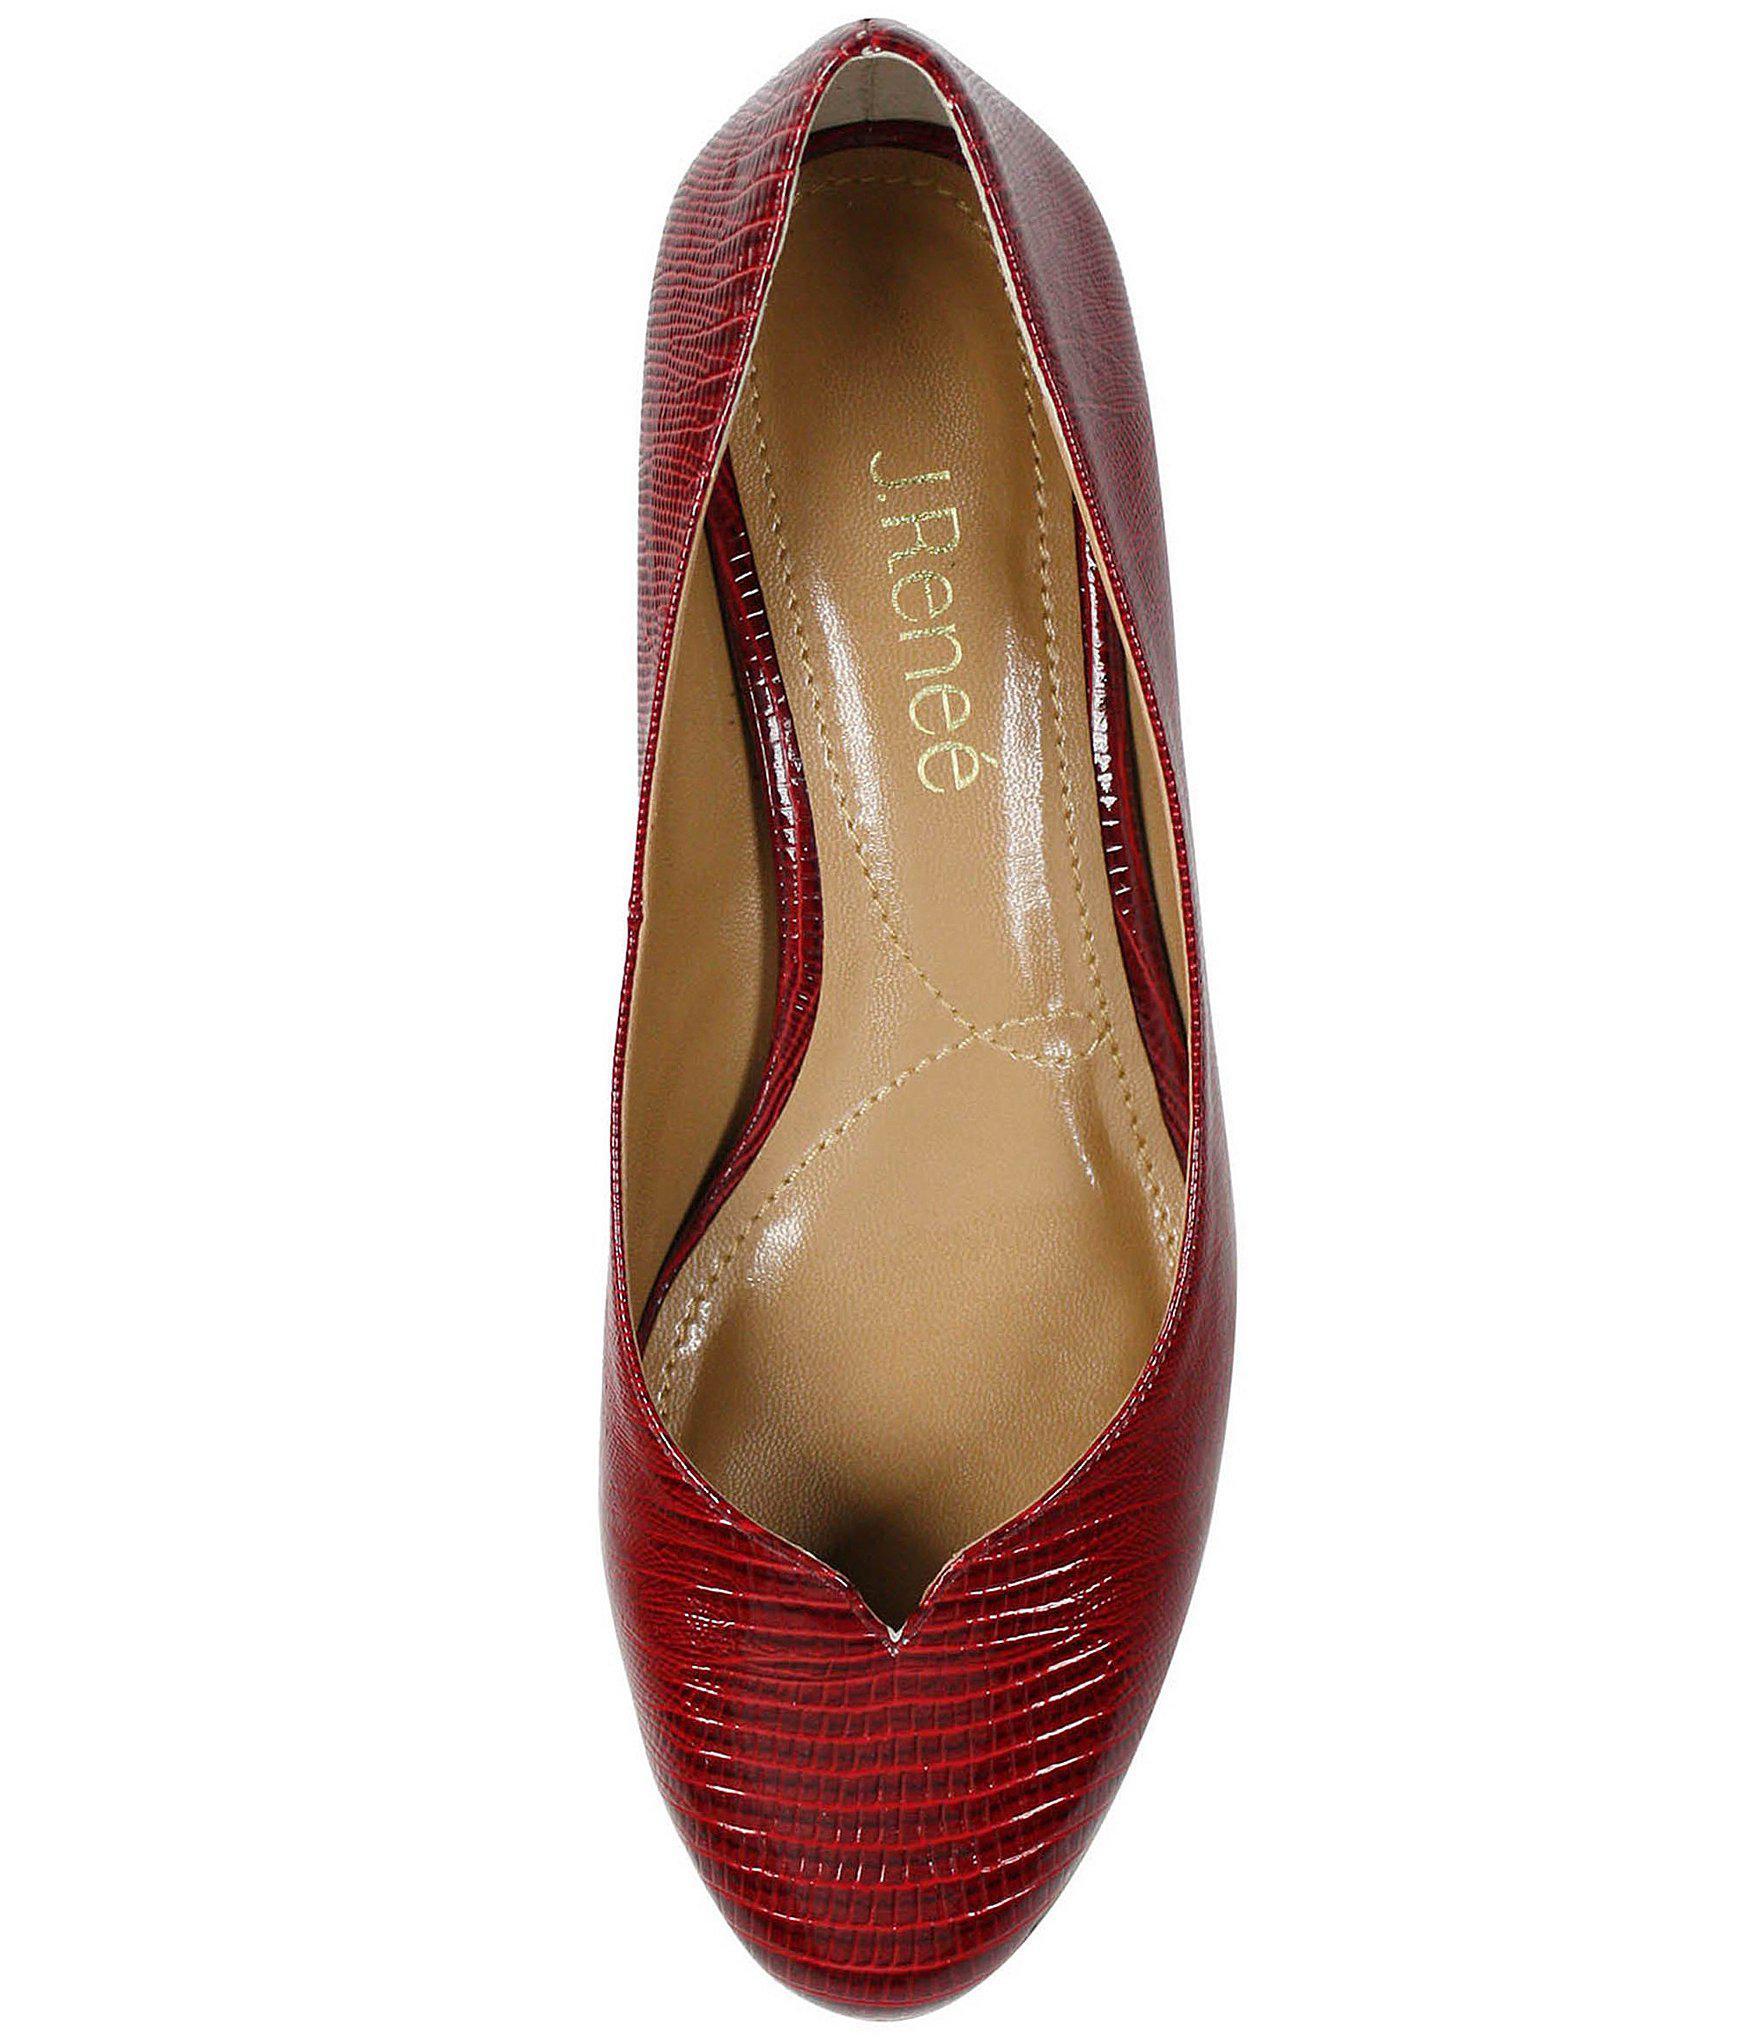 f2de1f5f4a2 Lyst - J. Reneé Bambalina Lizard Print Patent Leather Pumps in Red